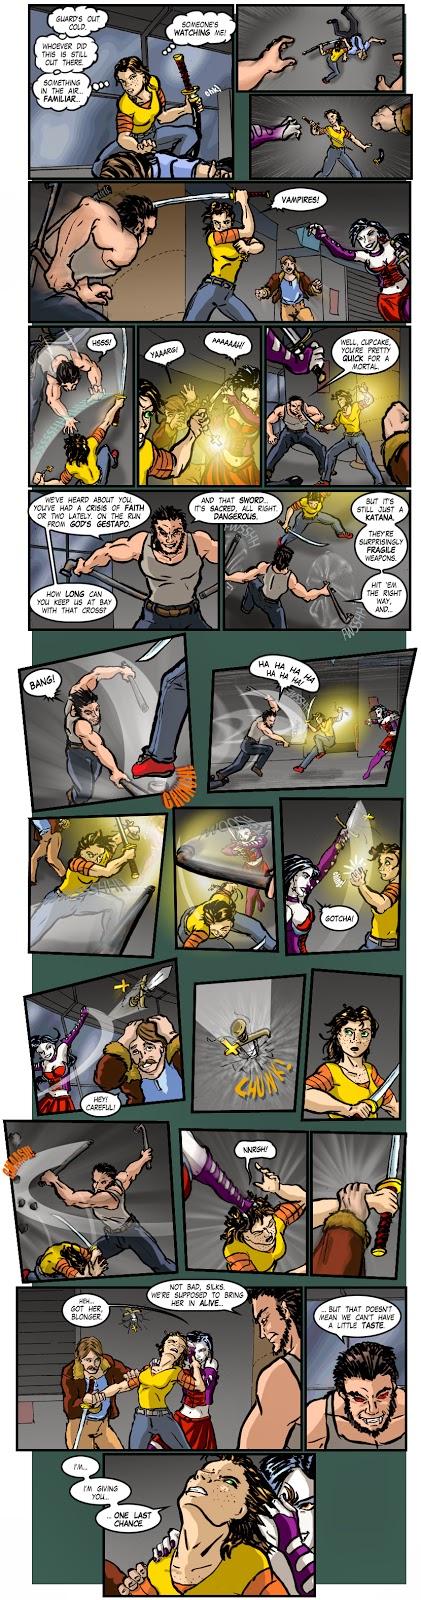 http://talesfromthevault.com/thunderstruck/comic708.html